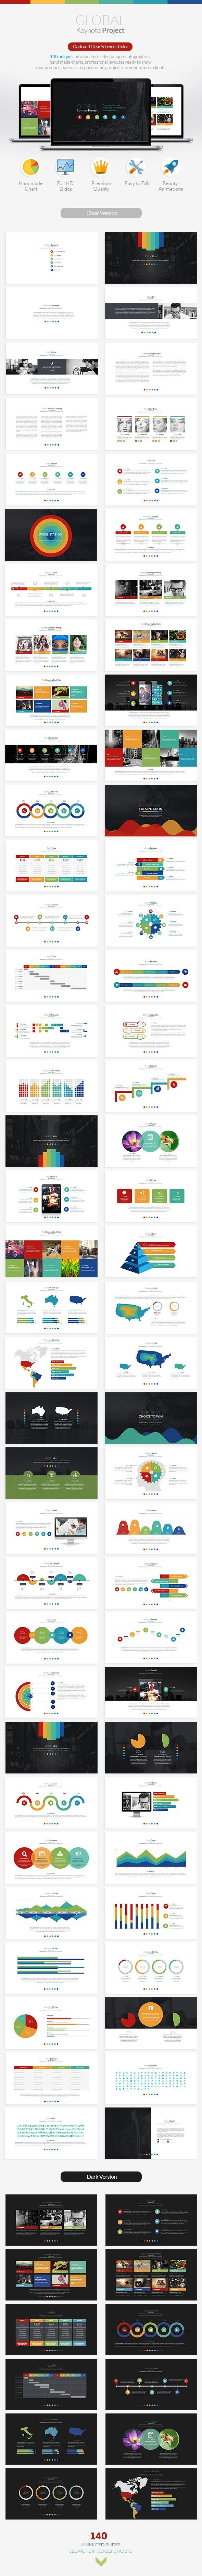 Global Project  Keynote Presentation - Business Keynote Templates